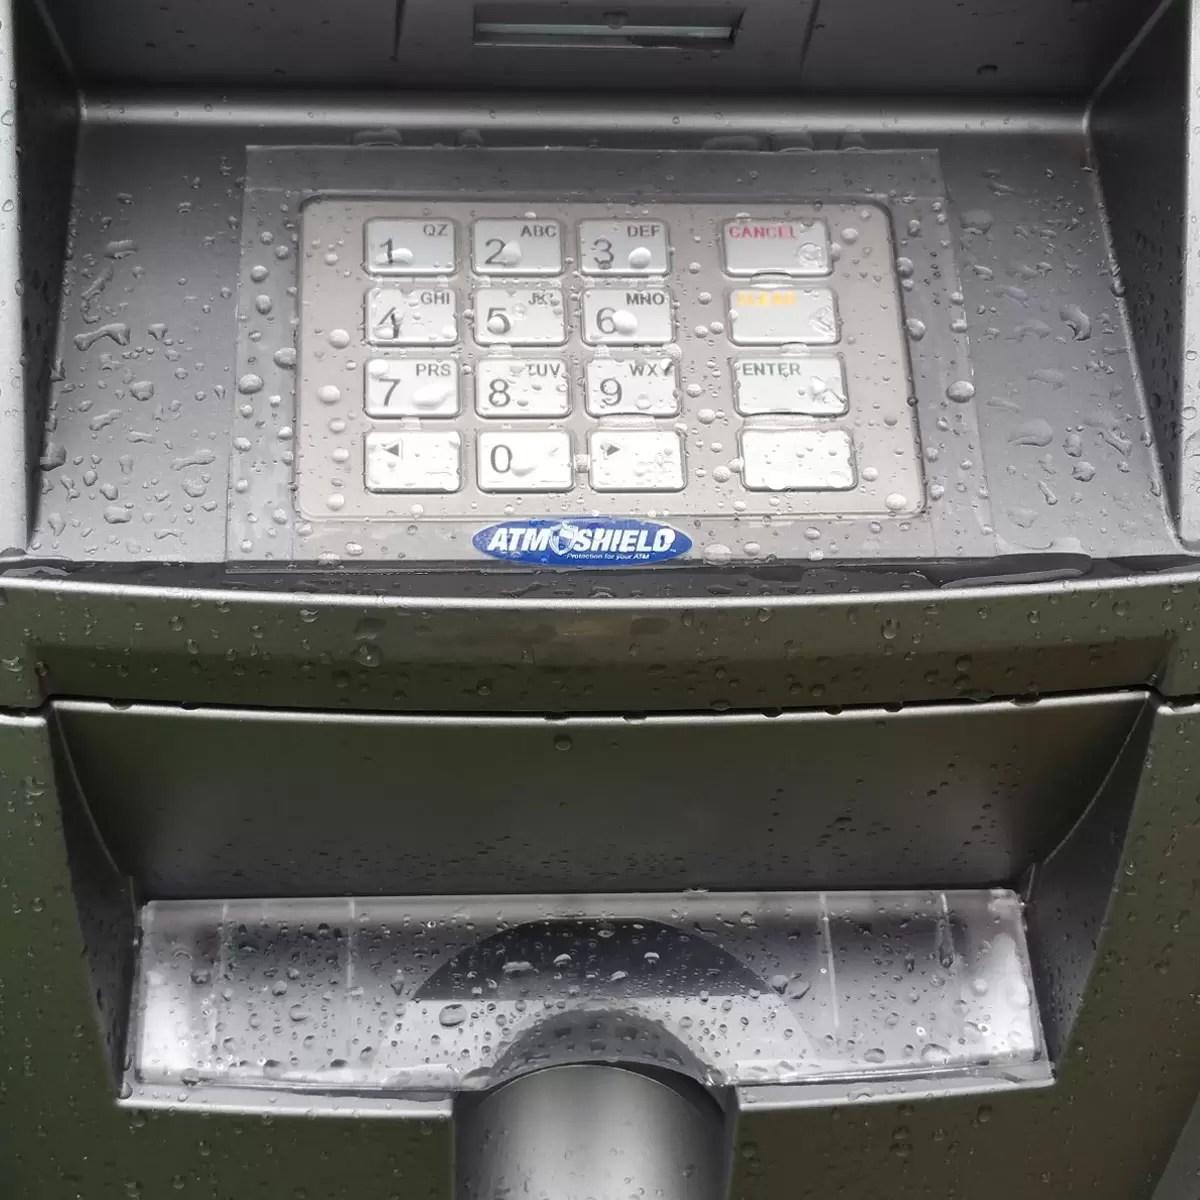 ATM Shield Keypad